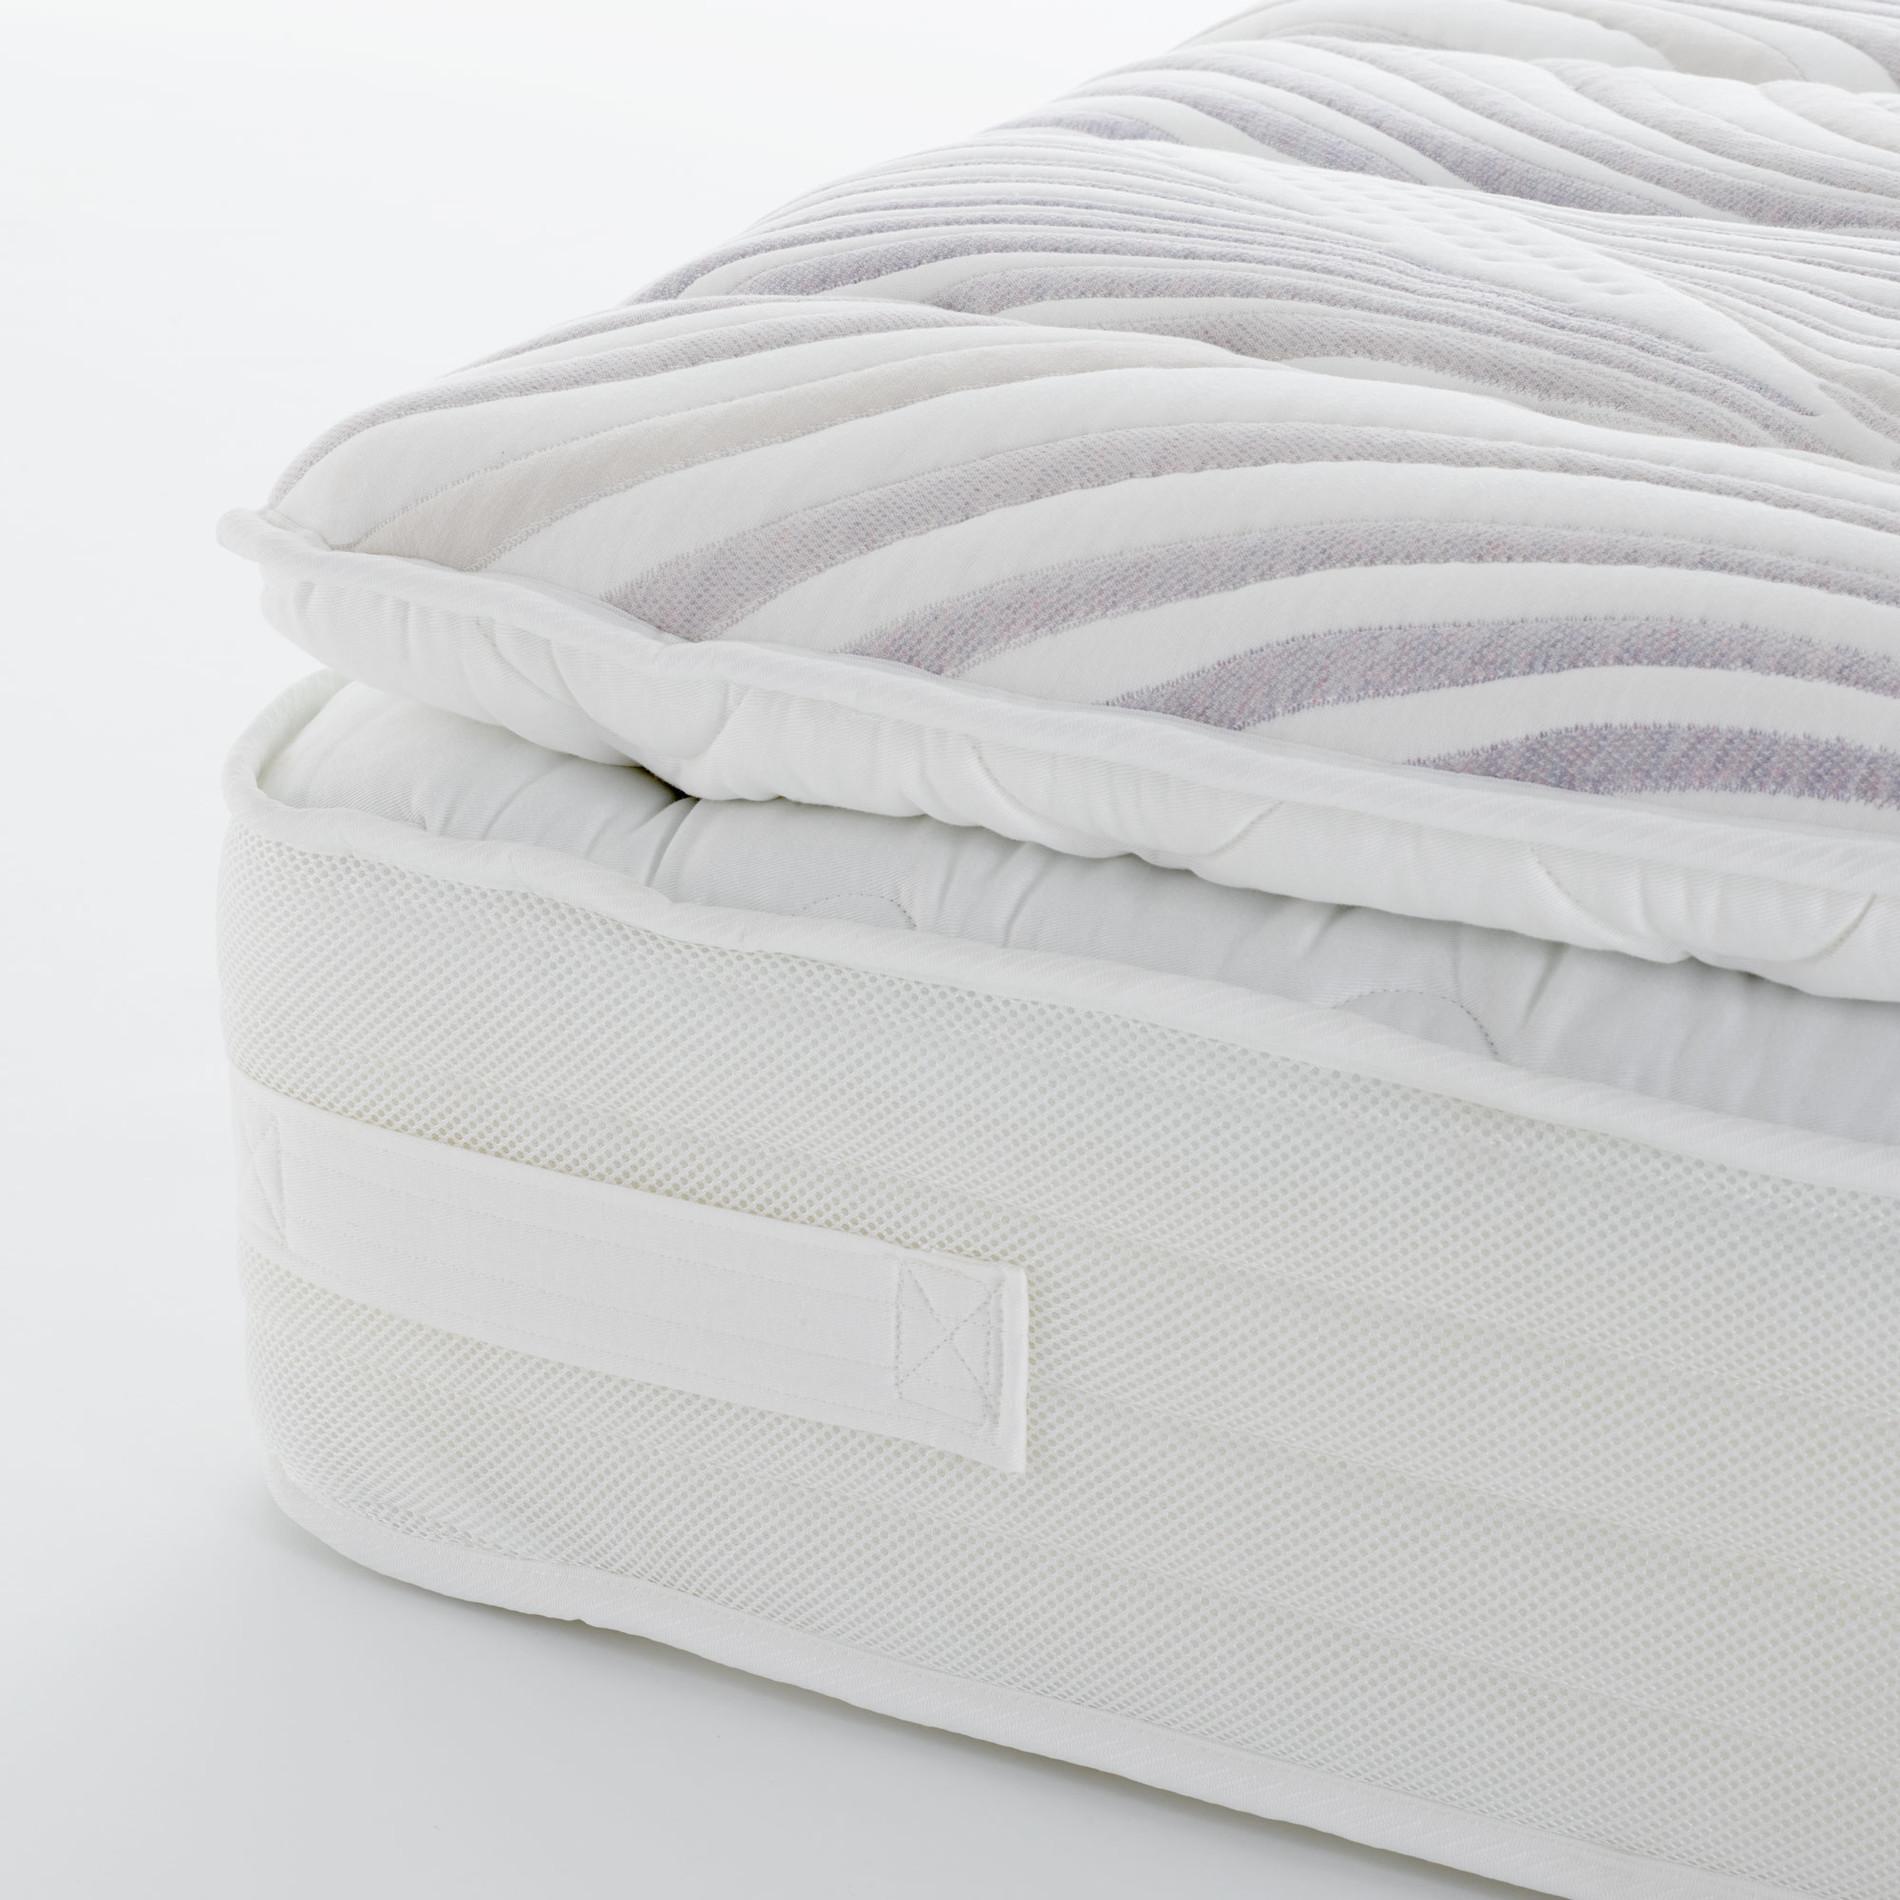 Malmesbury Posture Pocket Pillow Top 2000 King Size Mattress